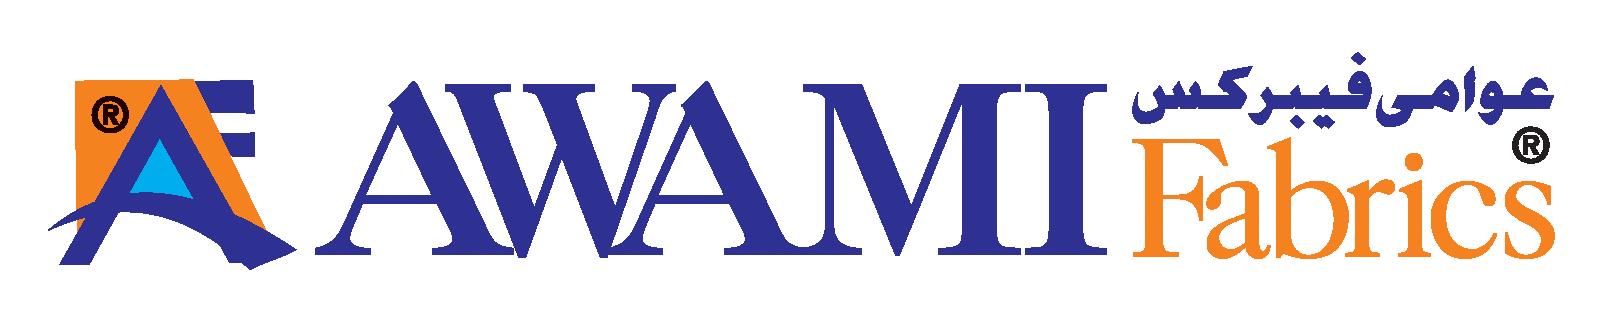 Awami Fabrics